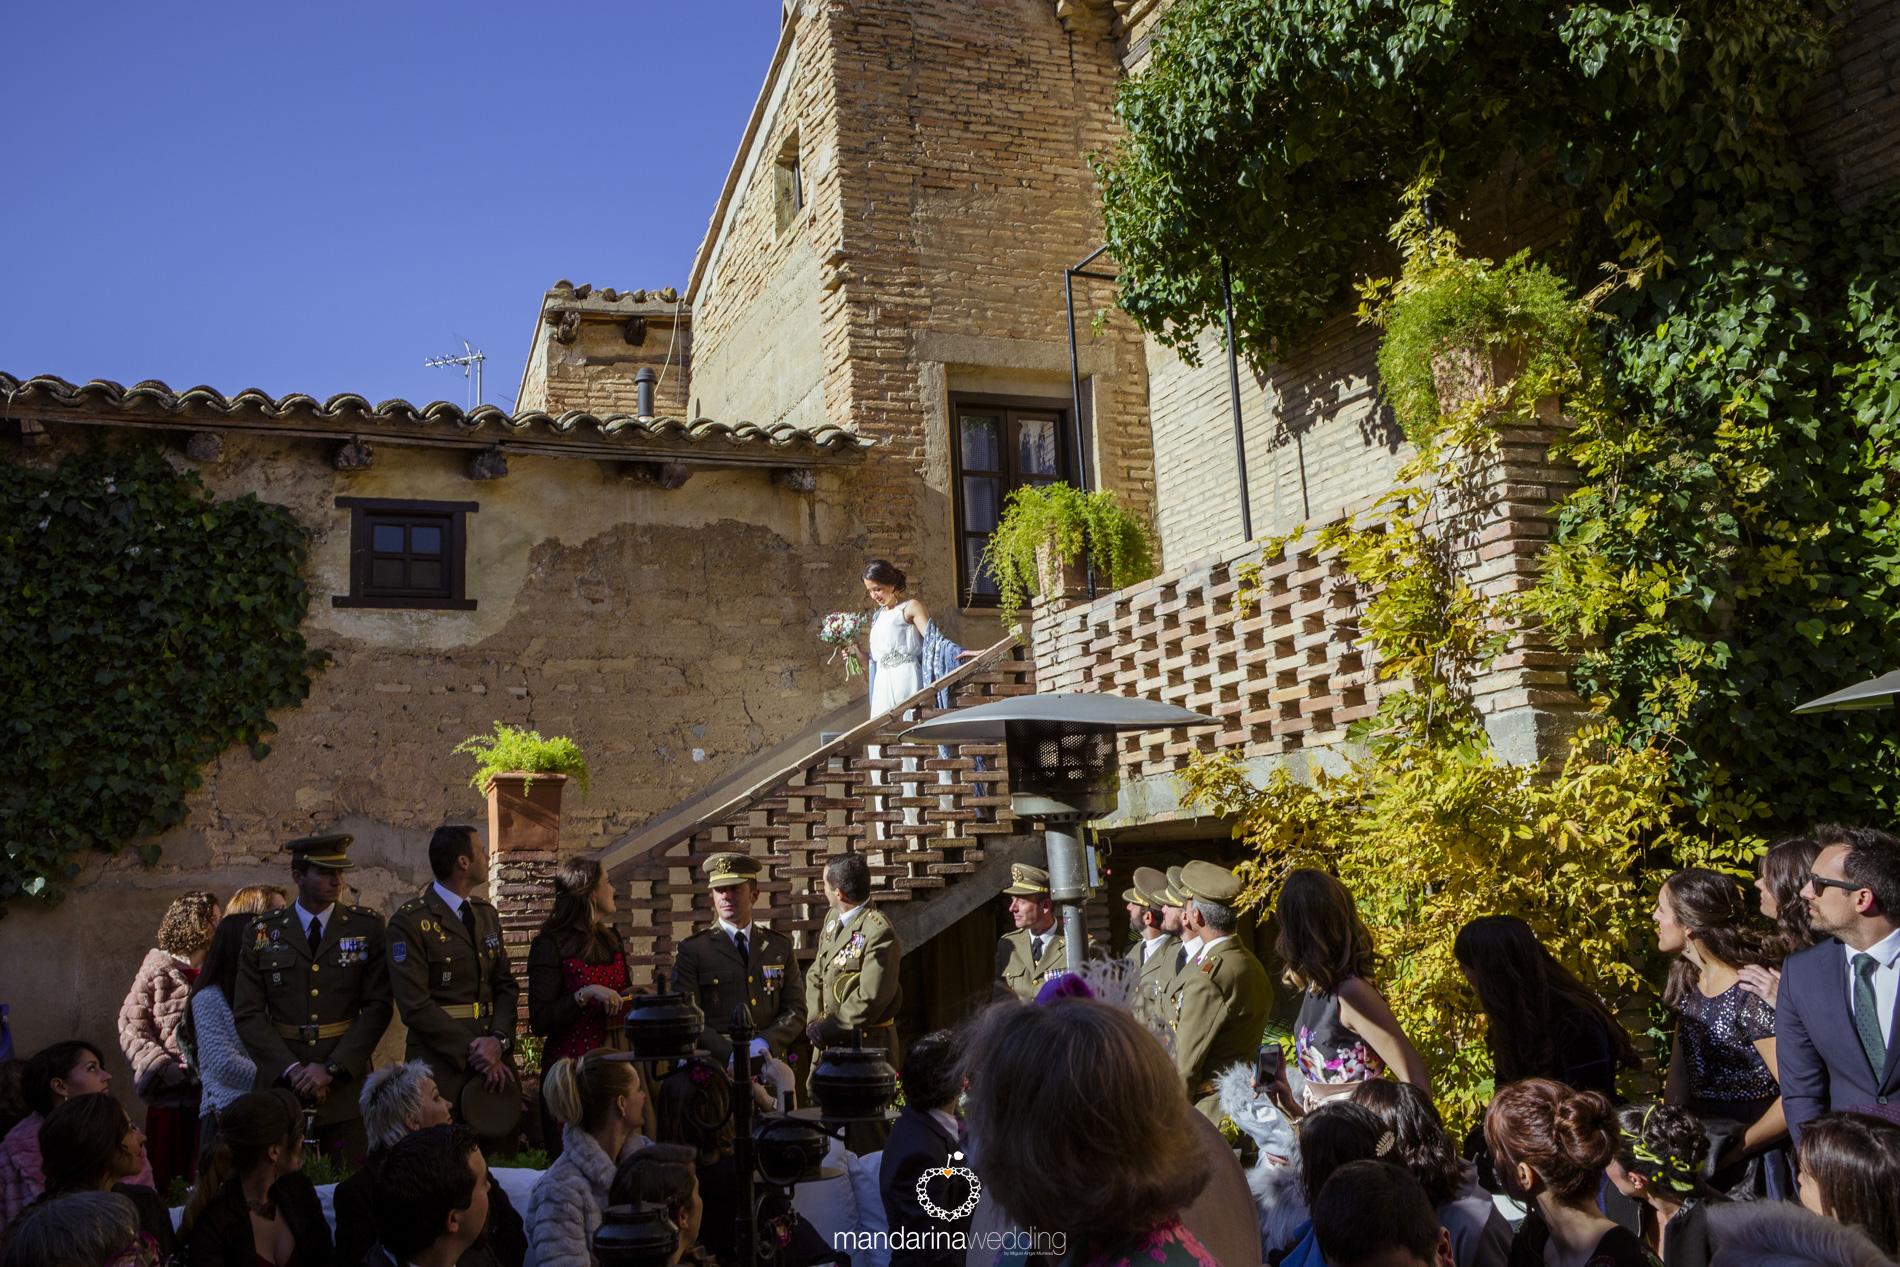 mandarina wedding, fotografos de boda, fotografo boda soria, fotografo boda barcelona, fotografo boda Madrid, fotógrafo boda lerida_18